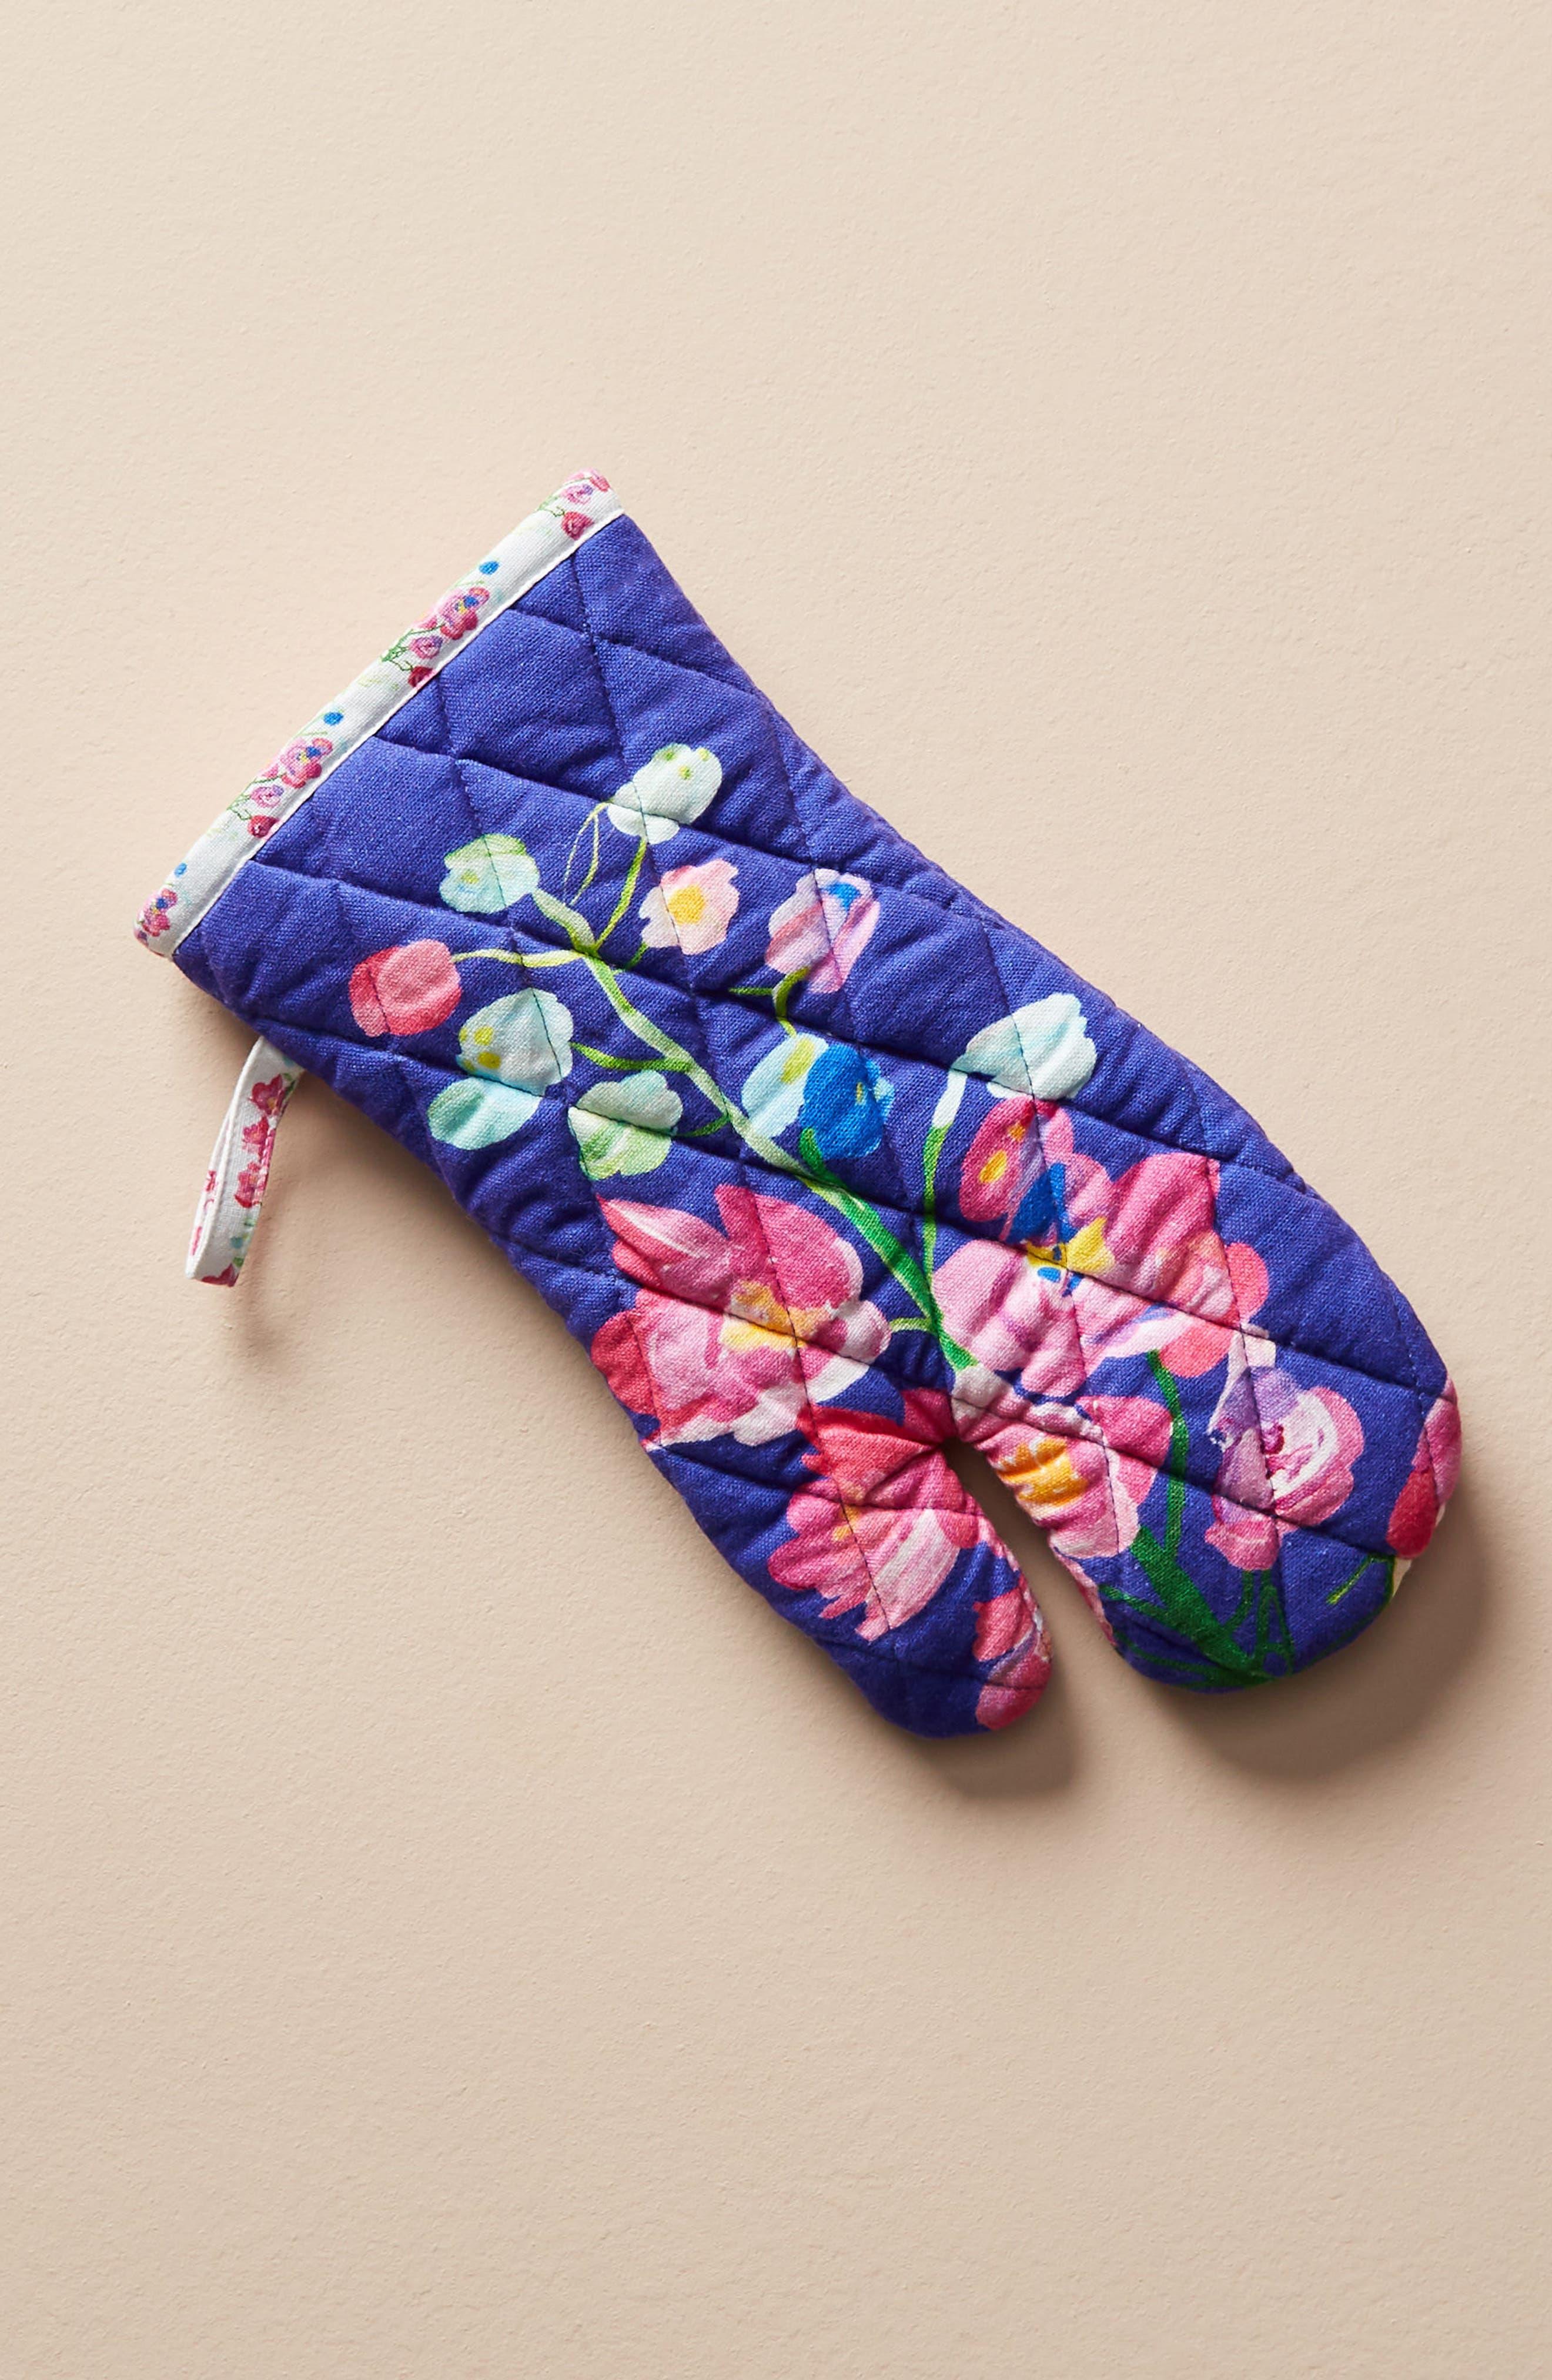 Paint + Petals Oven Mitt,                             Main thumbnail 1, color,                             Blue Combo